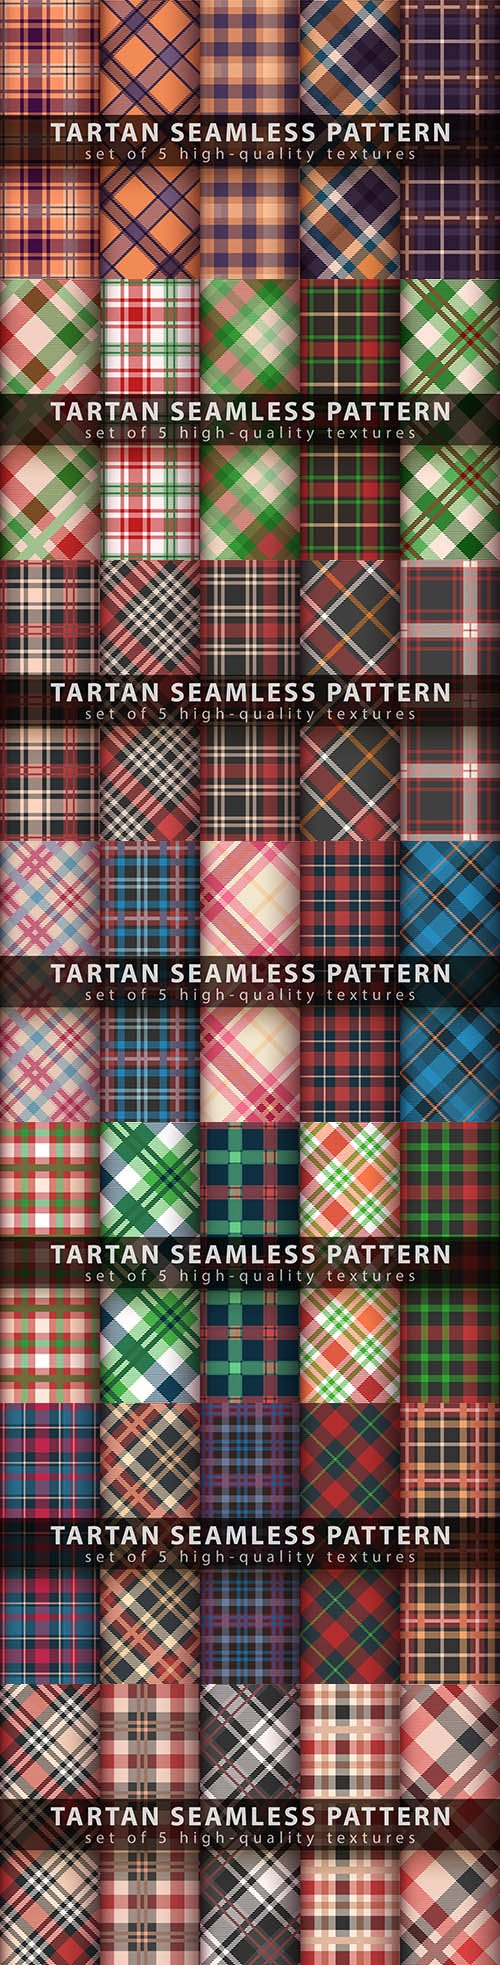 Classic tartan seamless pattern design set illustration